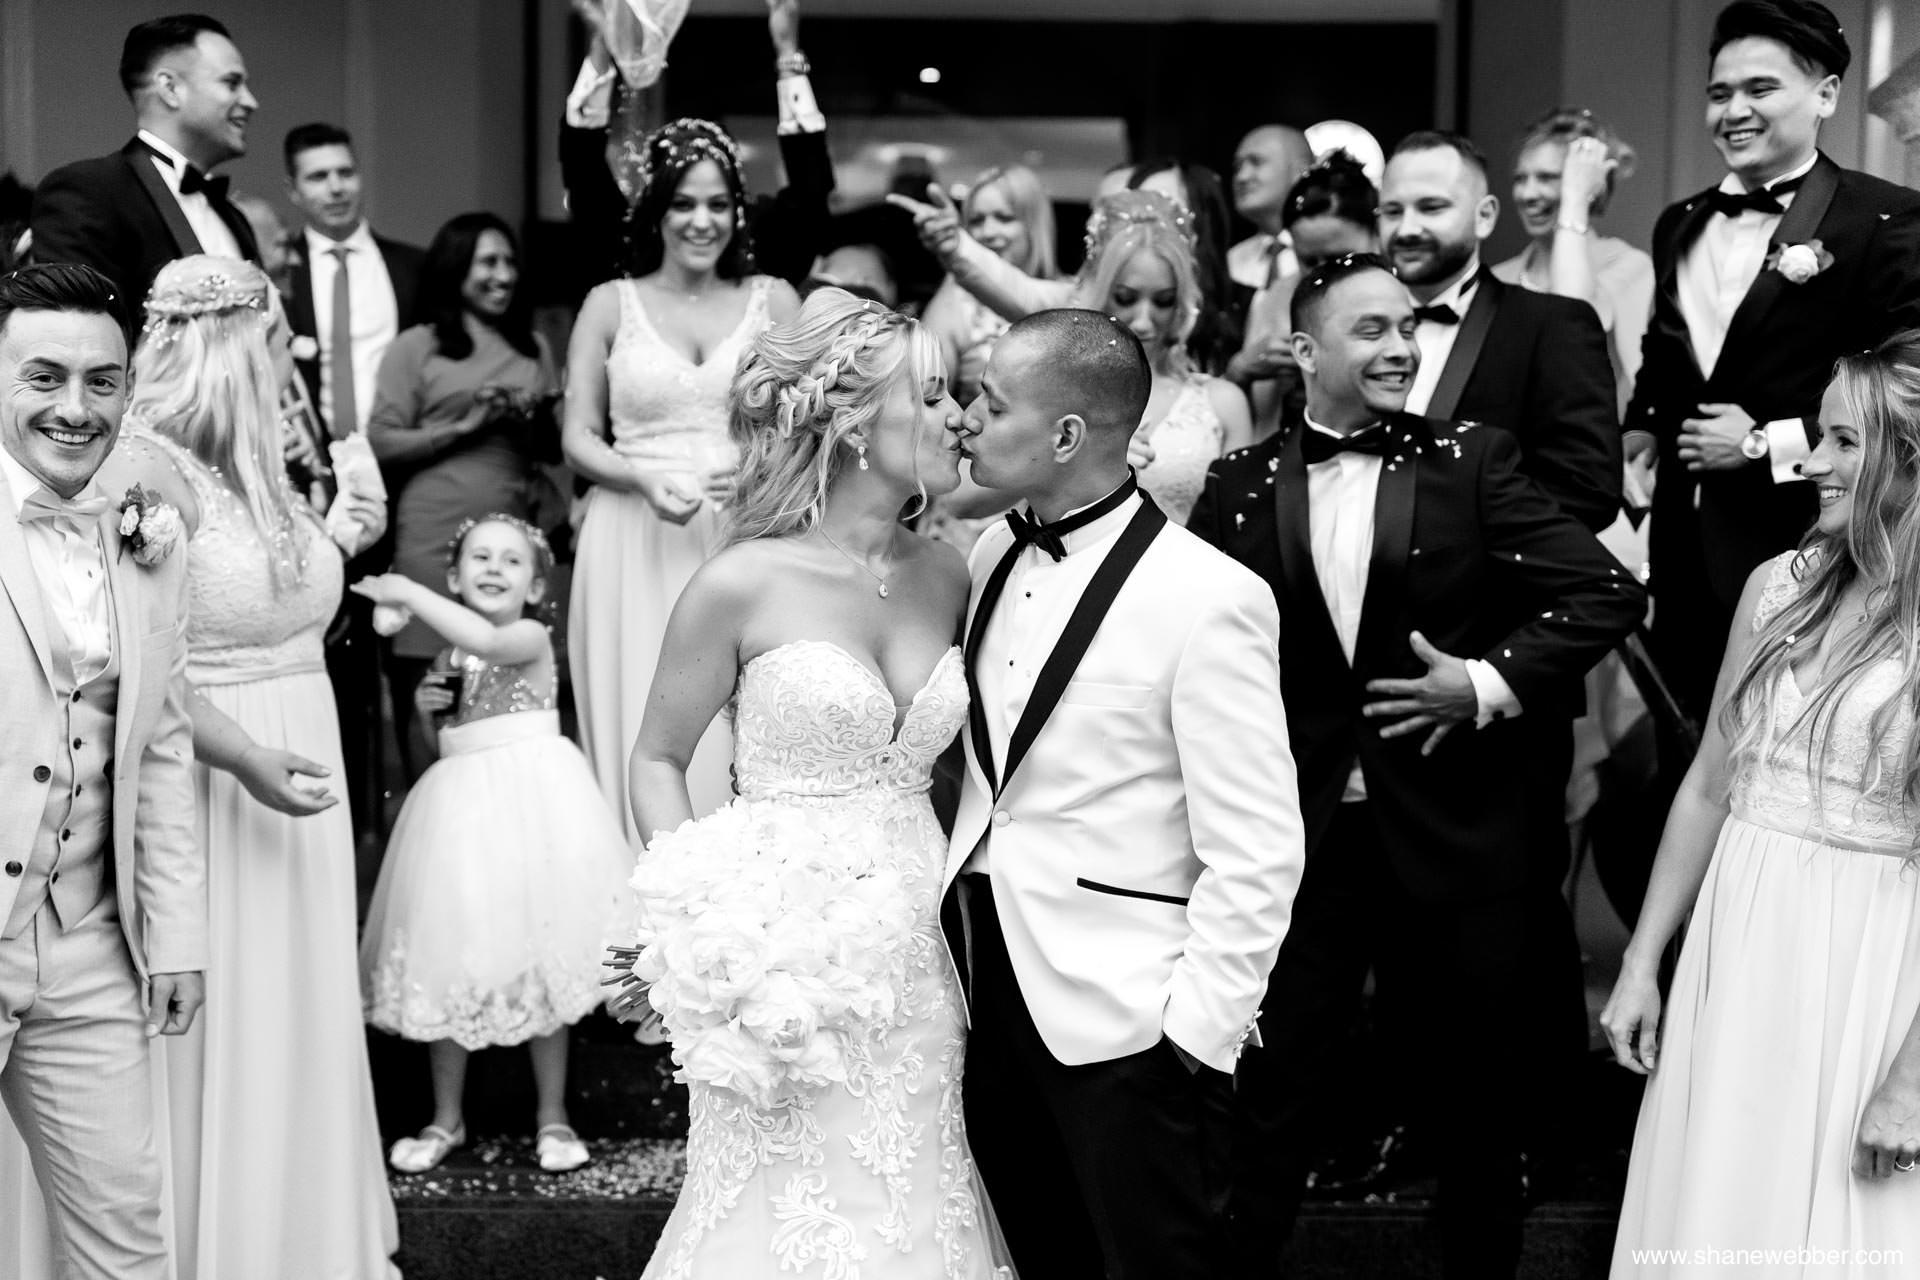 The Midland Manchester wedding photos